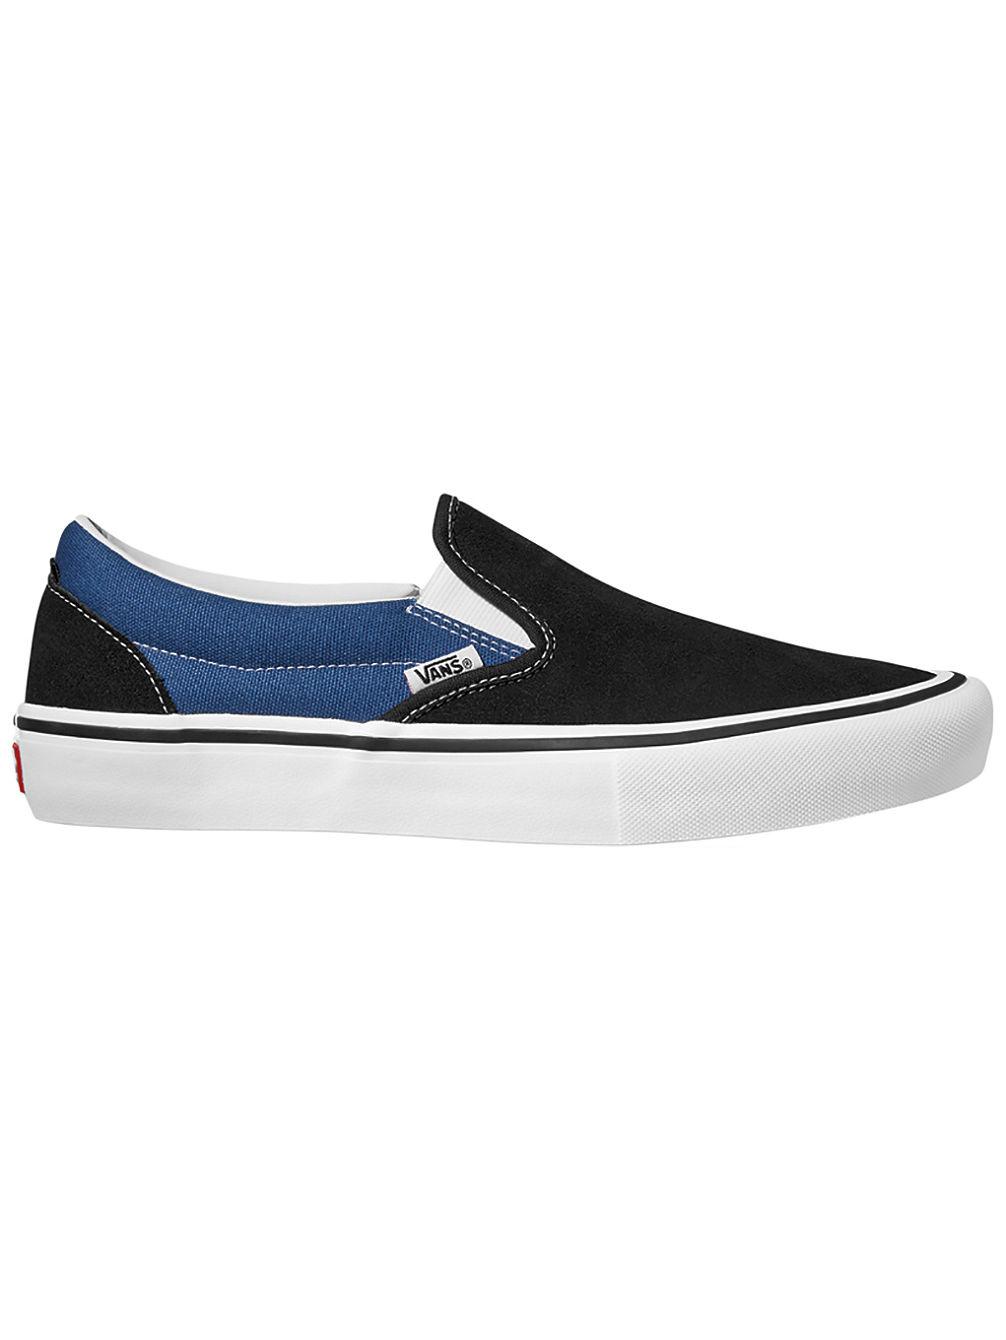 d6ff5558b4 Buy Vans X Antihero Pro Slip-Ons online at Blue Tomato